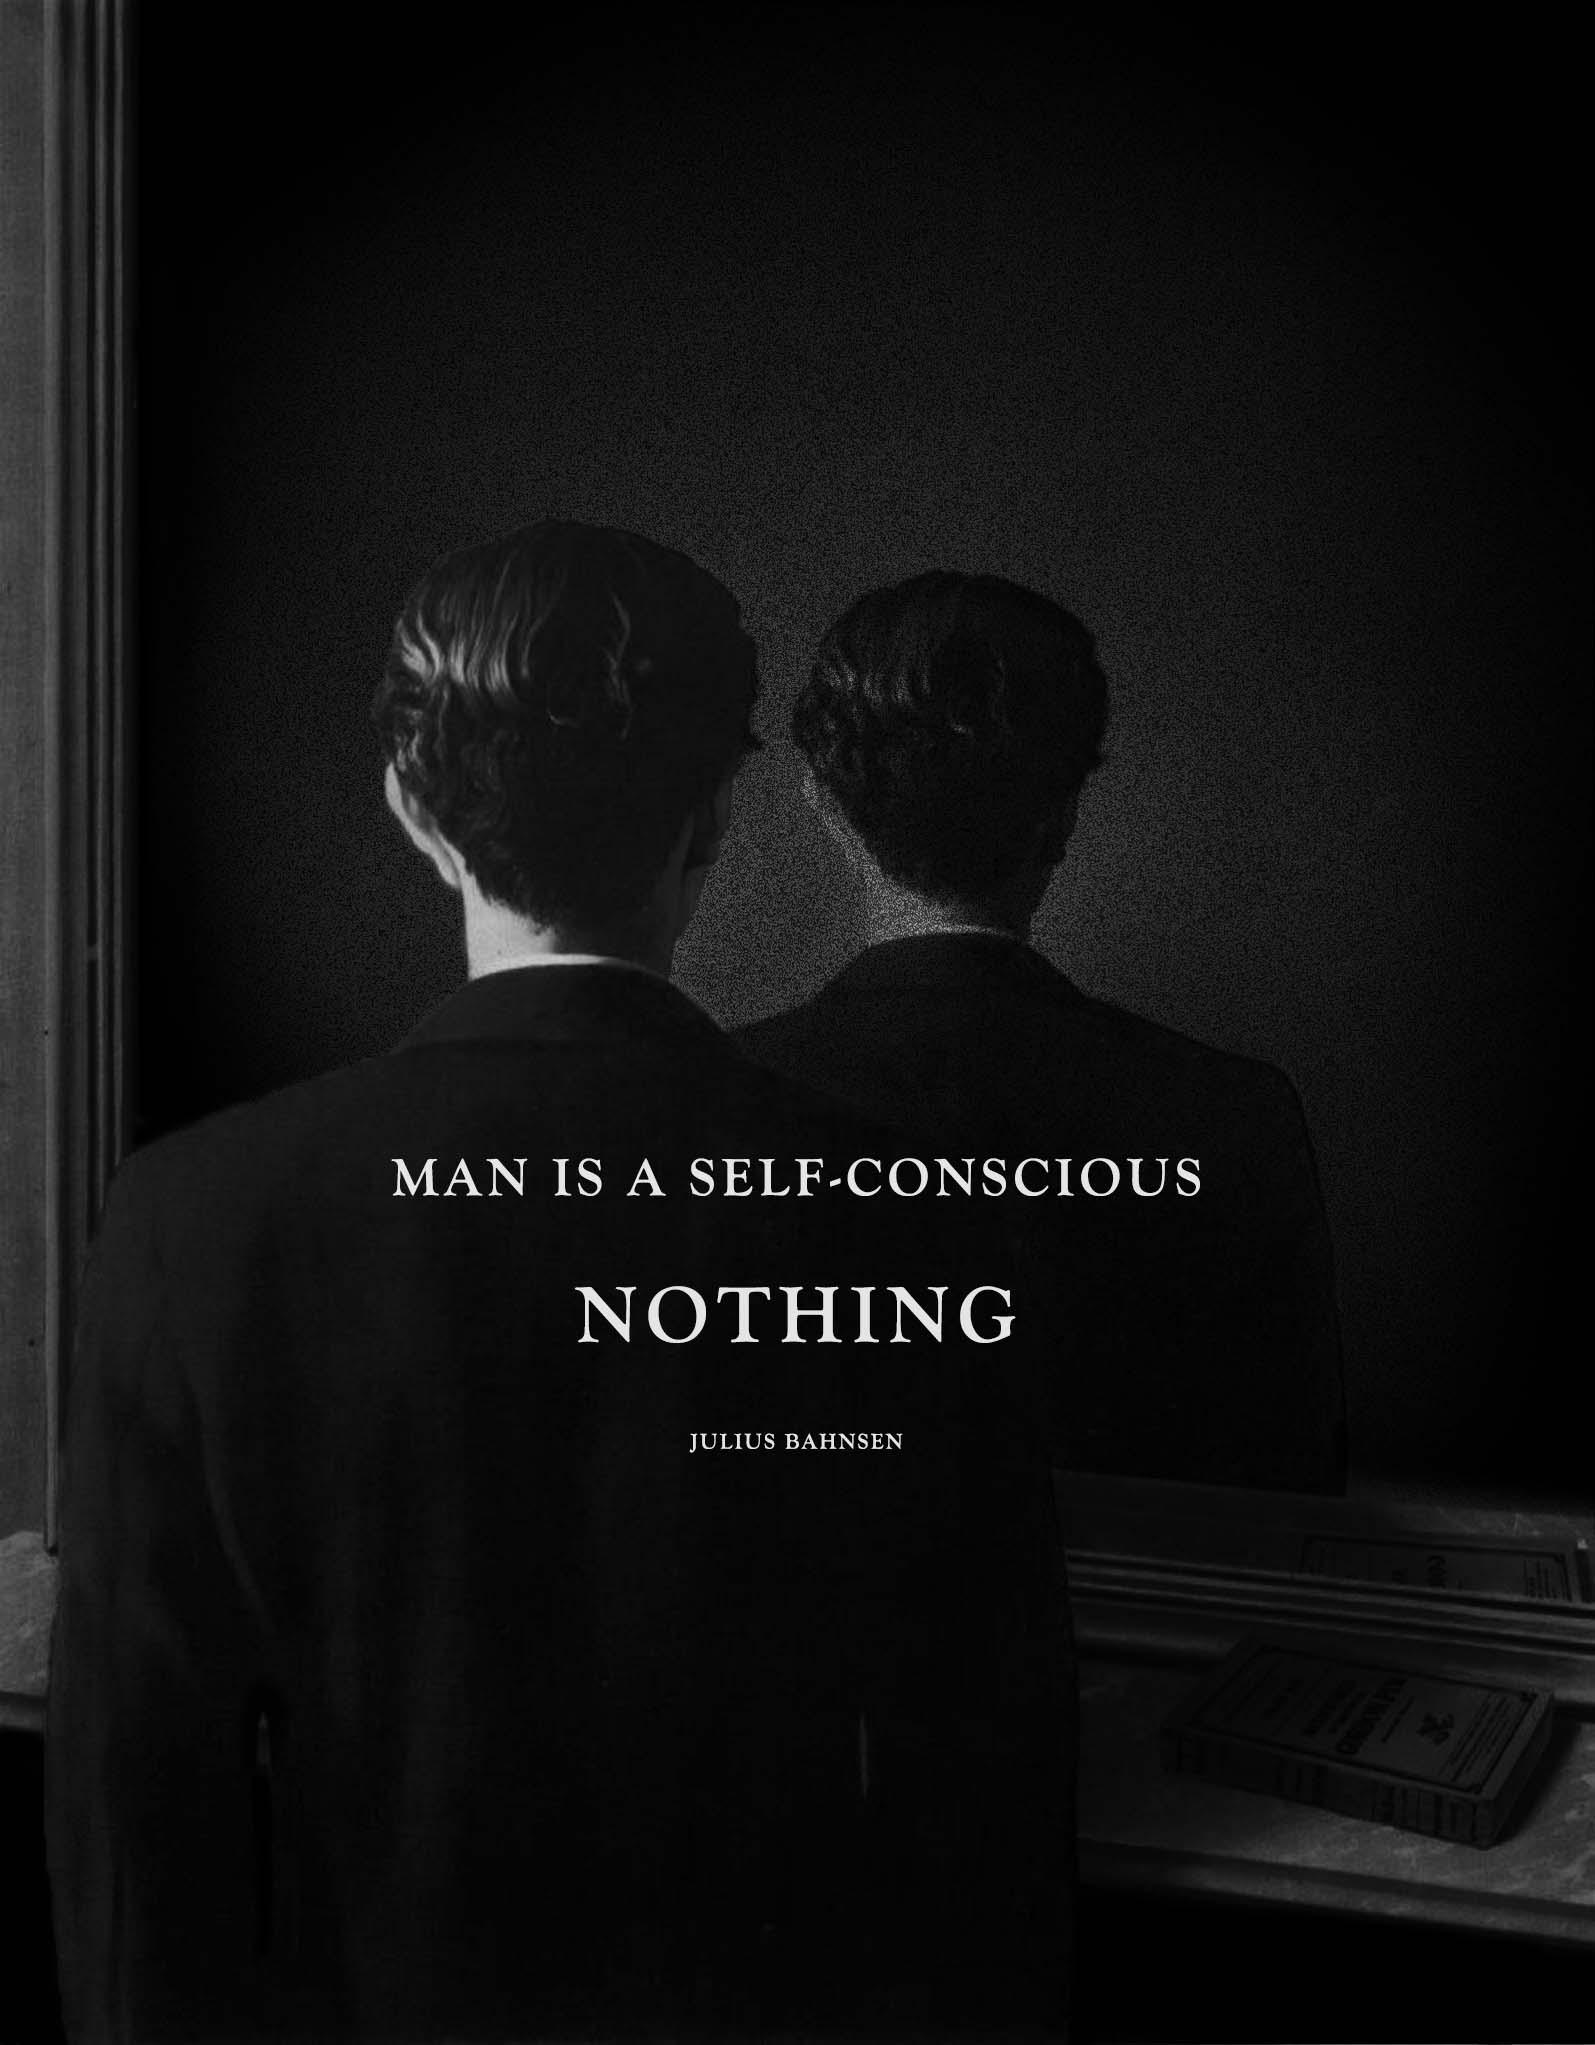 """Man is a self-conscious nothing"" —Julius Bahnsen [1595x 2045] [OC]"